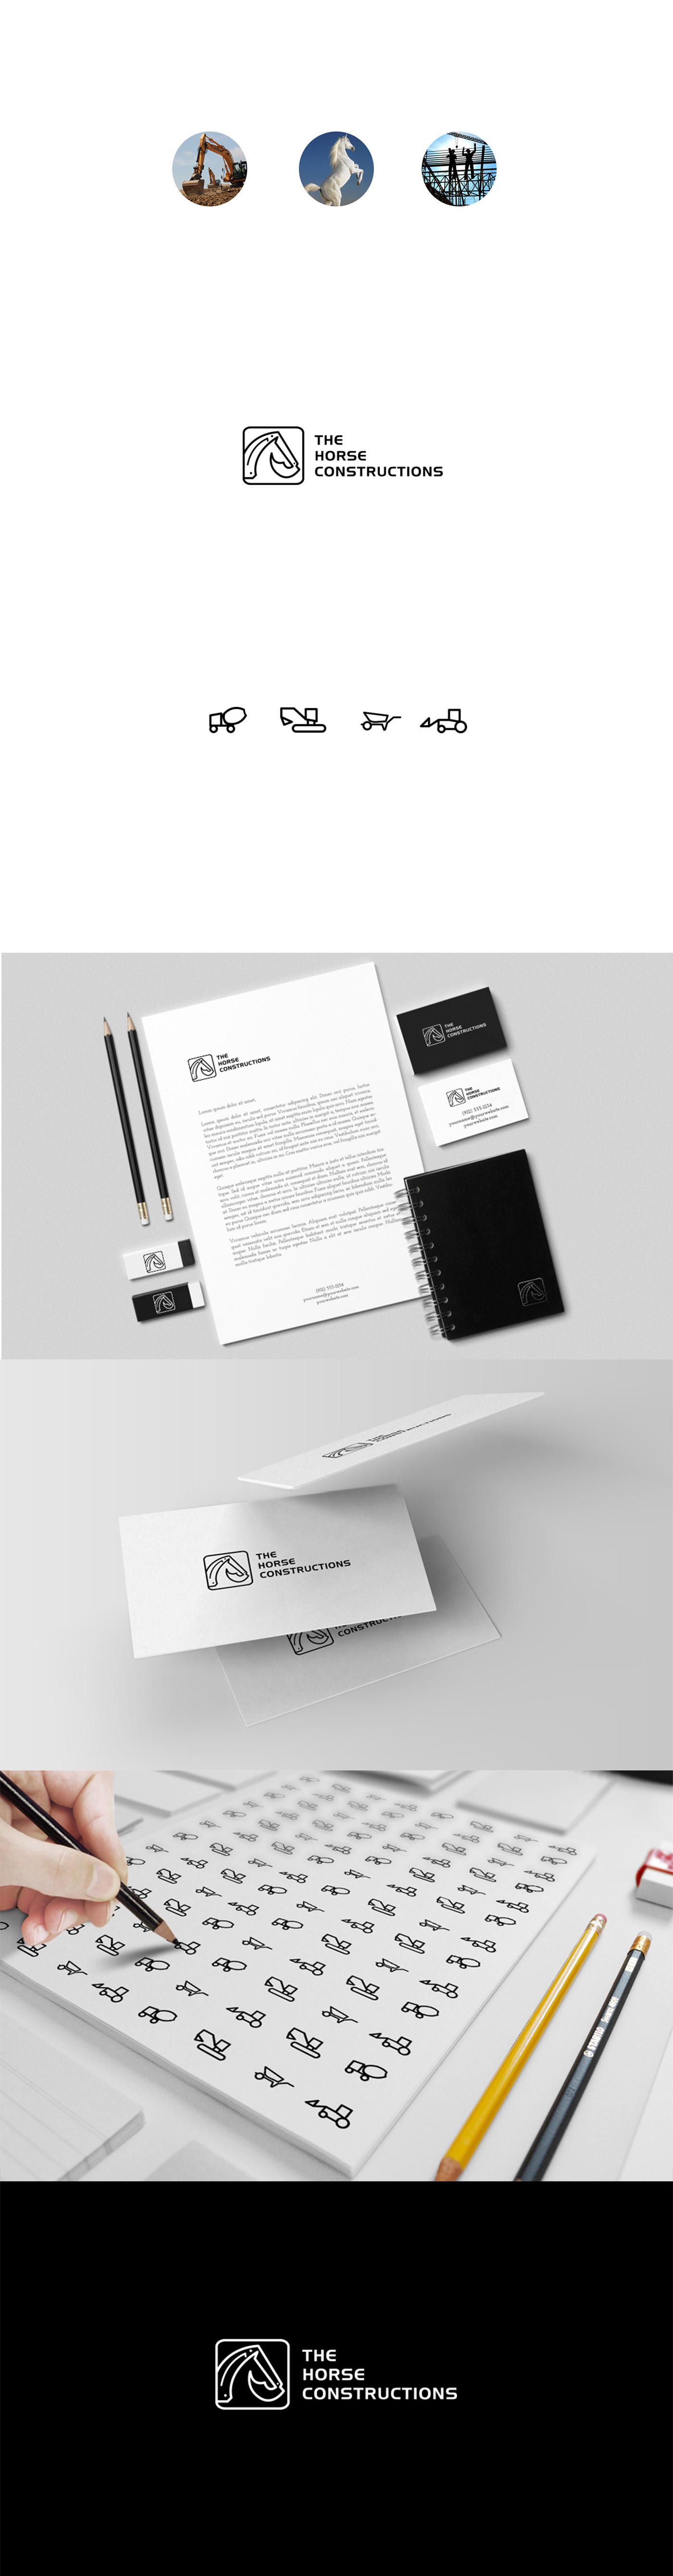 Identidad de Marca para empresas constructoras - The Horse Constructions por Bransense Branding